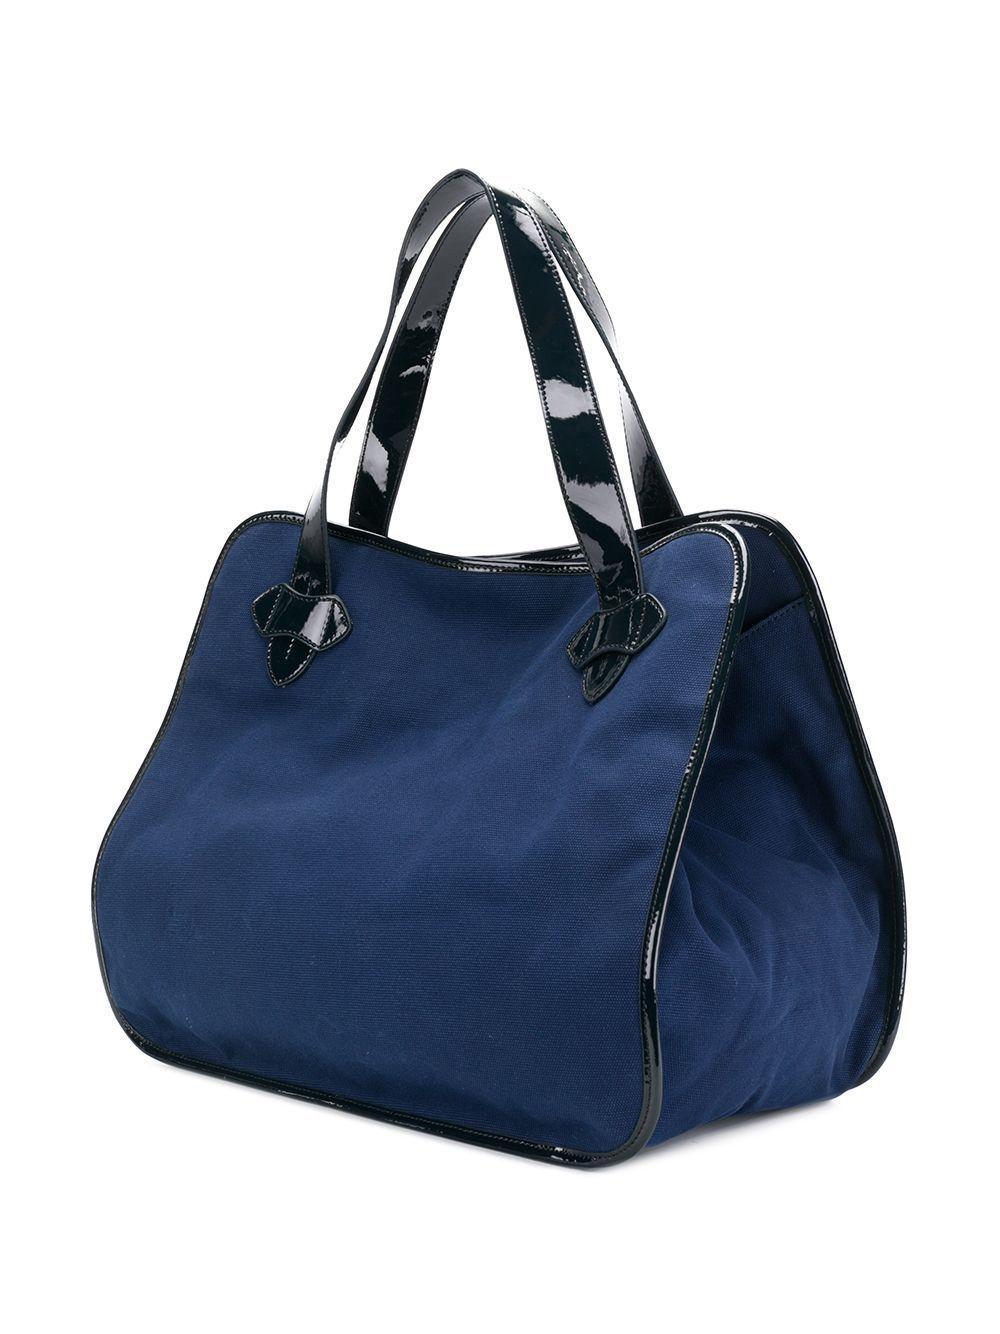 Tila March Canvas Zalig Xl Tote Bag in Blue